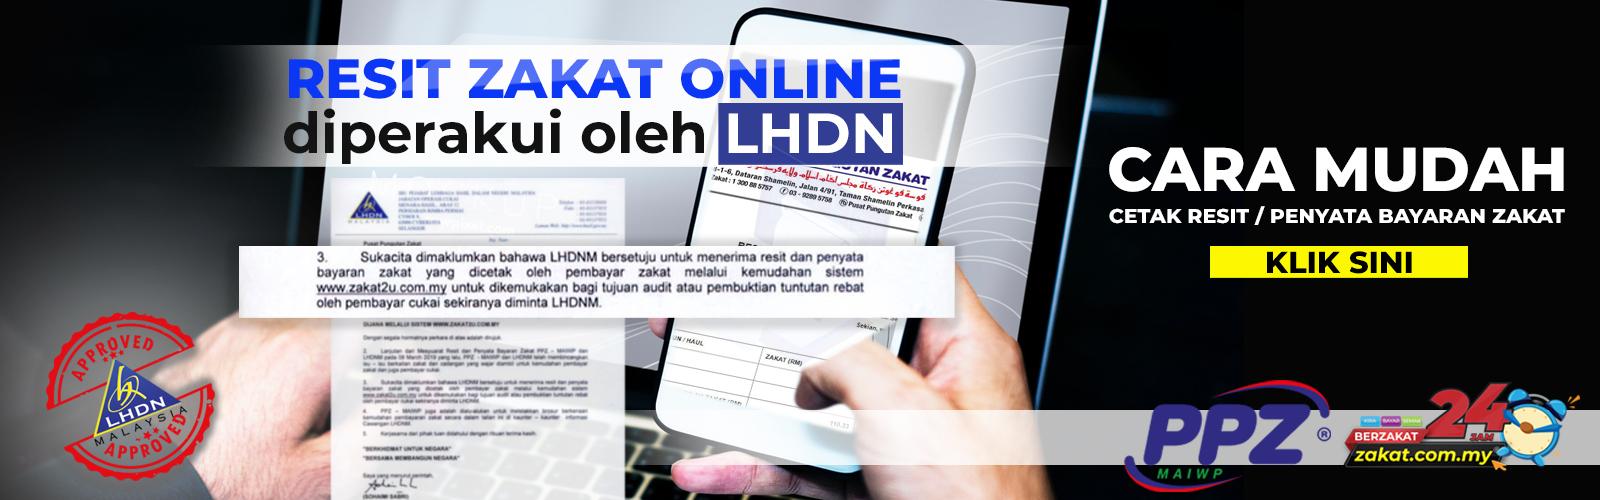 "Search Results for ""zakat fitrah "" – Pusat Pungutan Zakat-MAIWP"